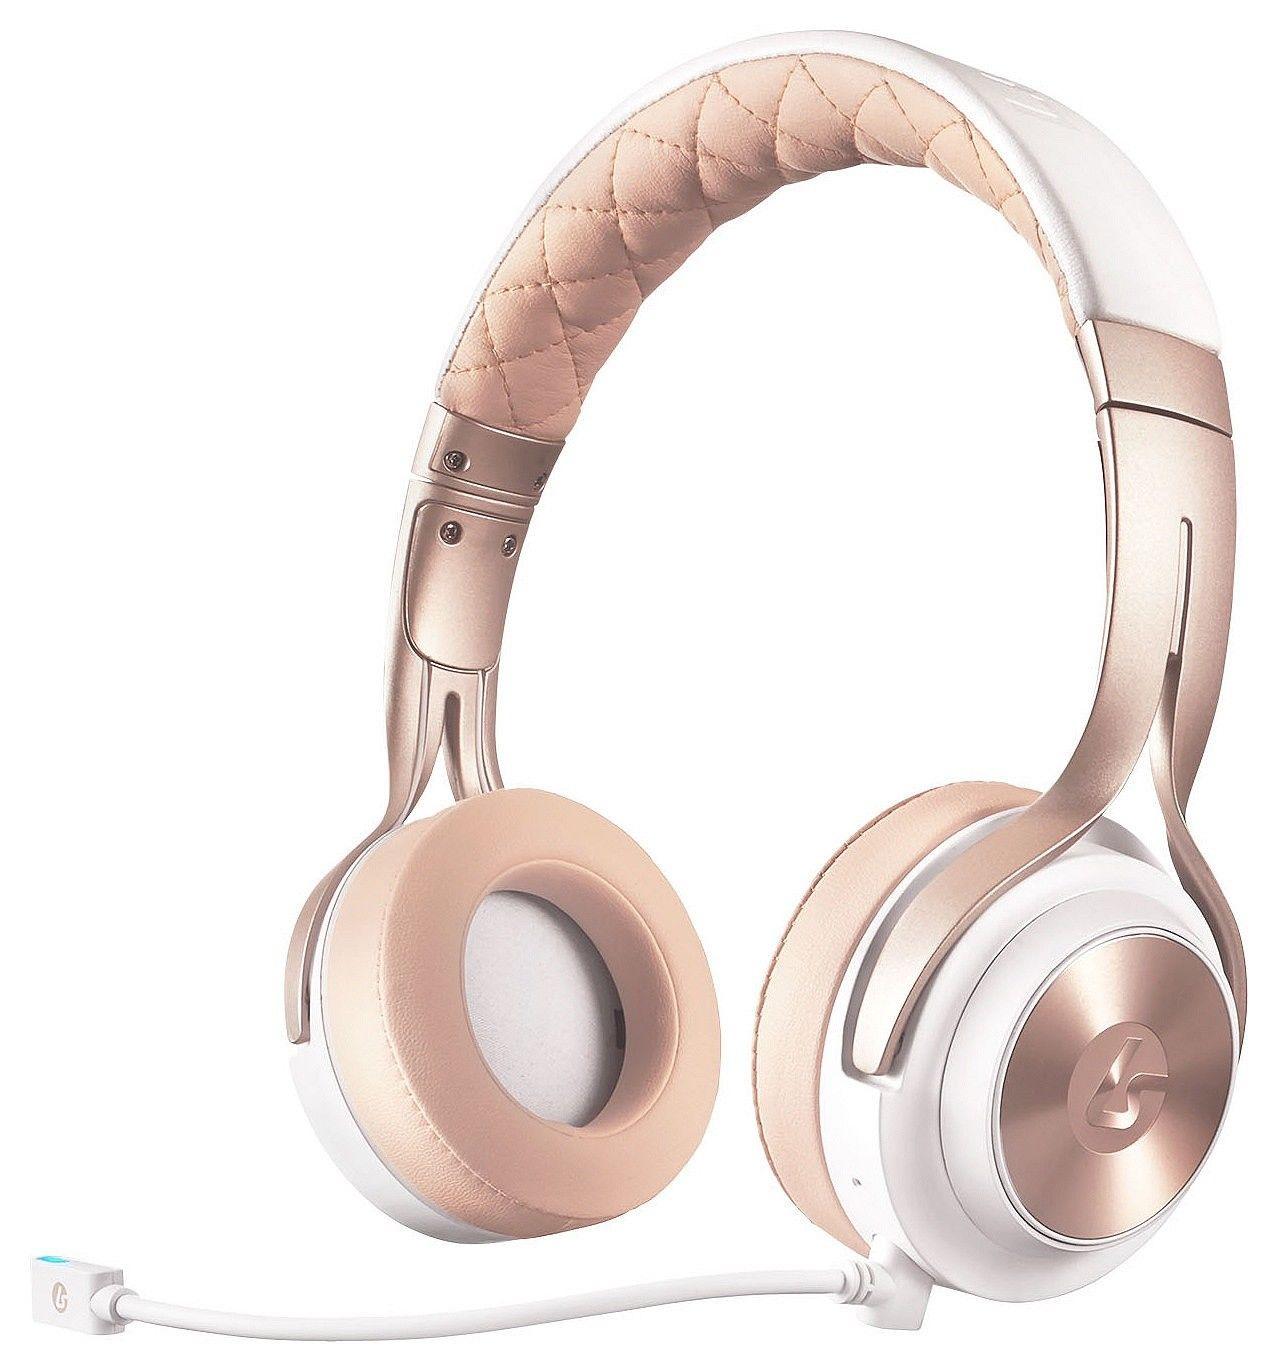 LucidSound 20 (LS20) headphones (new) £22.99 Argos eBay store. Bargain!!!